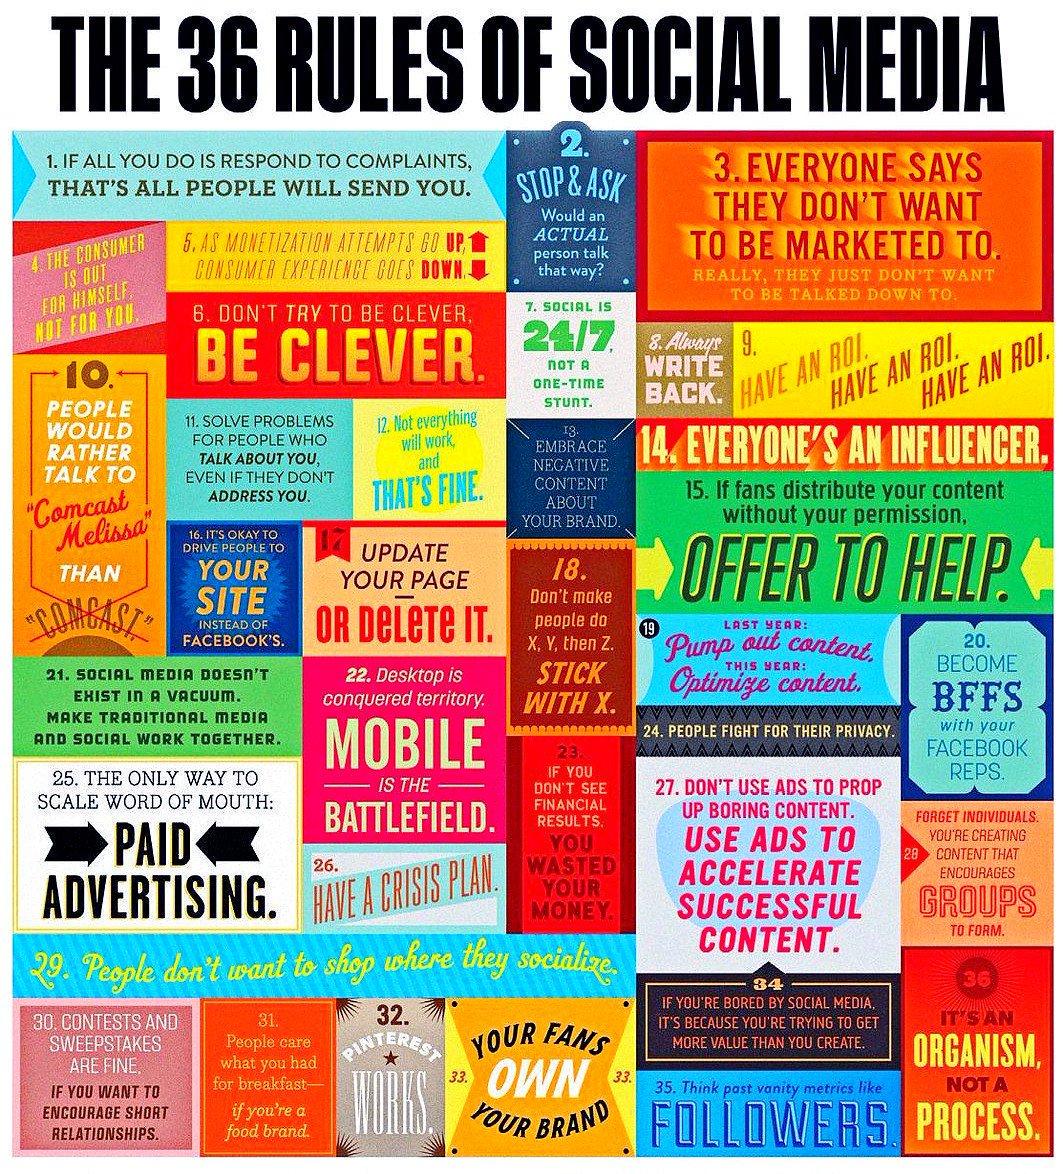 The 36 Rules of Social Media [Infographic]  #SocialMedia #SMM #GrowthHacking #ContentMarketing #DigitalMarketing <br>http://pic.twitter.com/QRVBIE4gEz